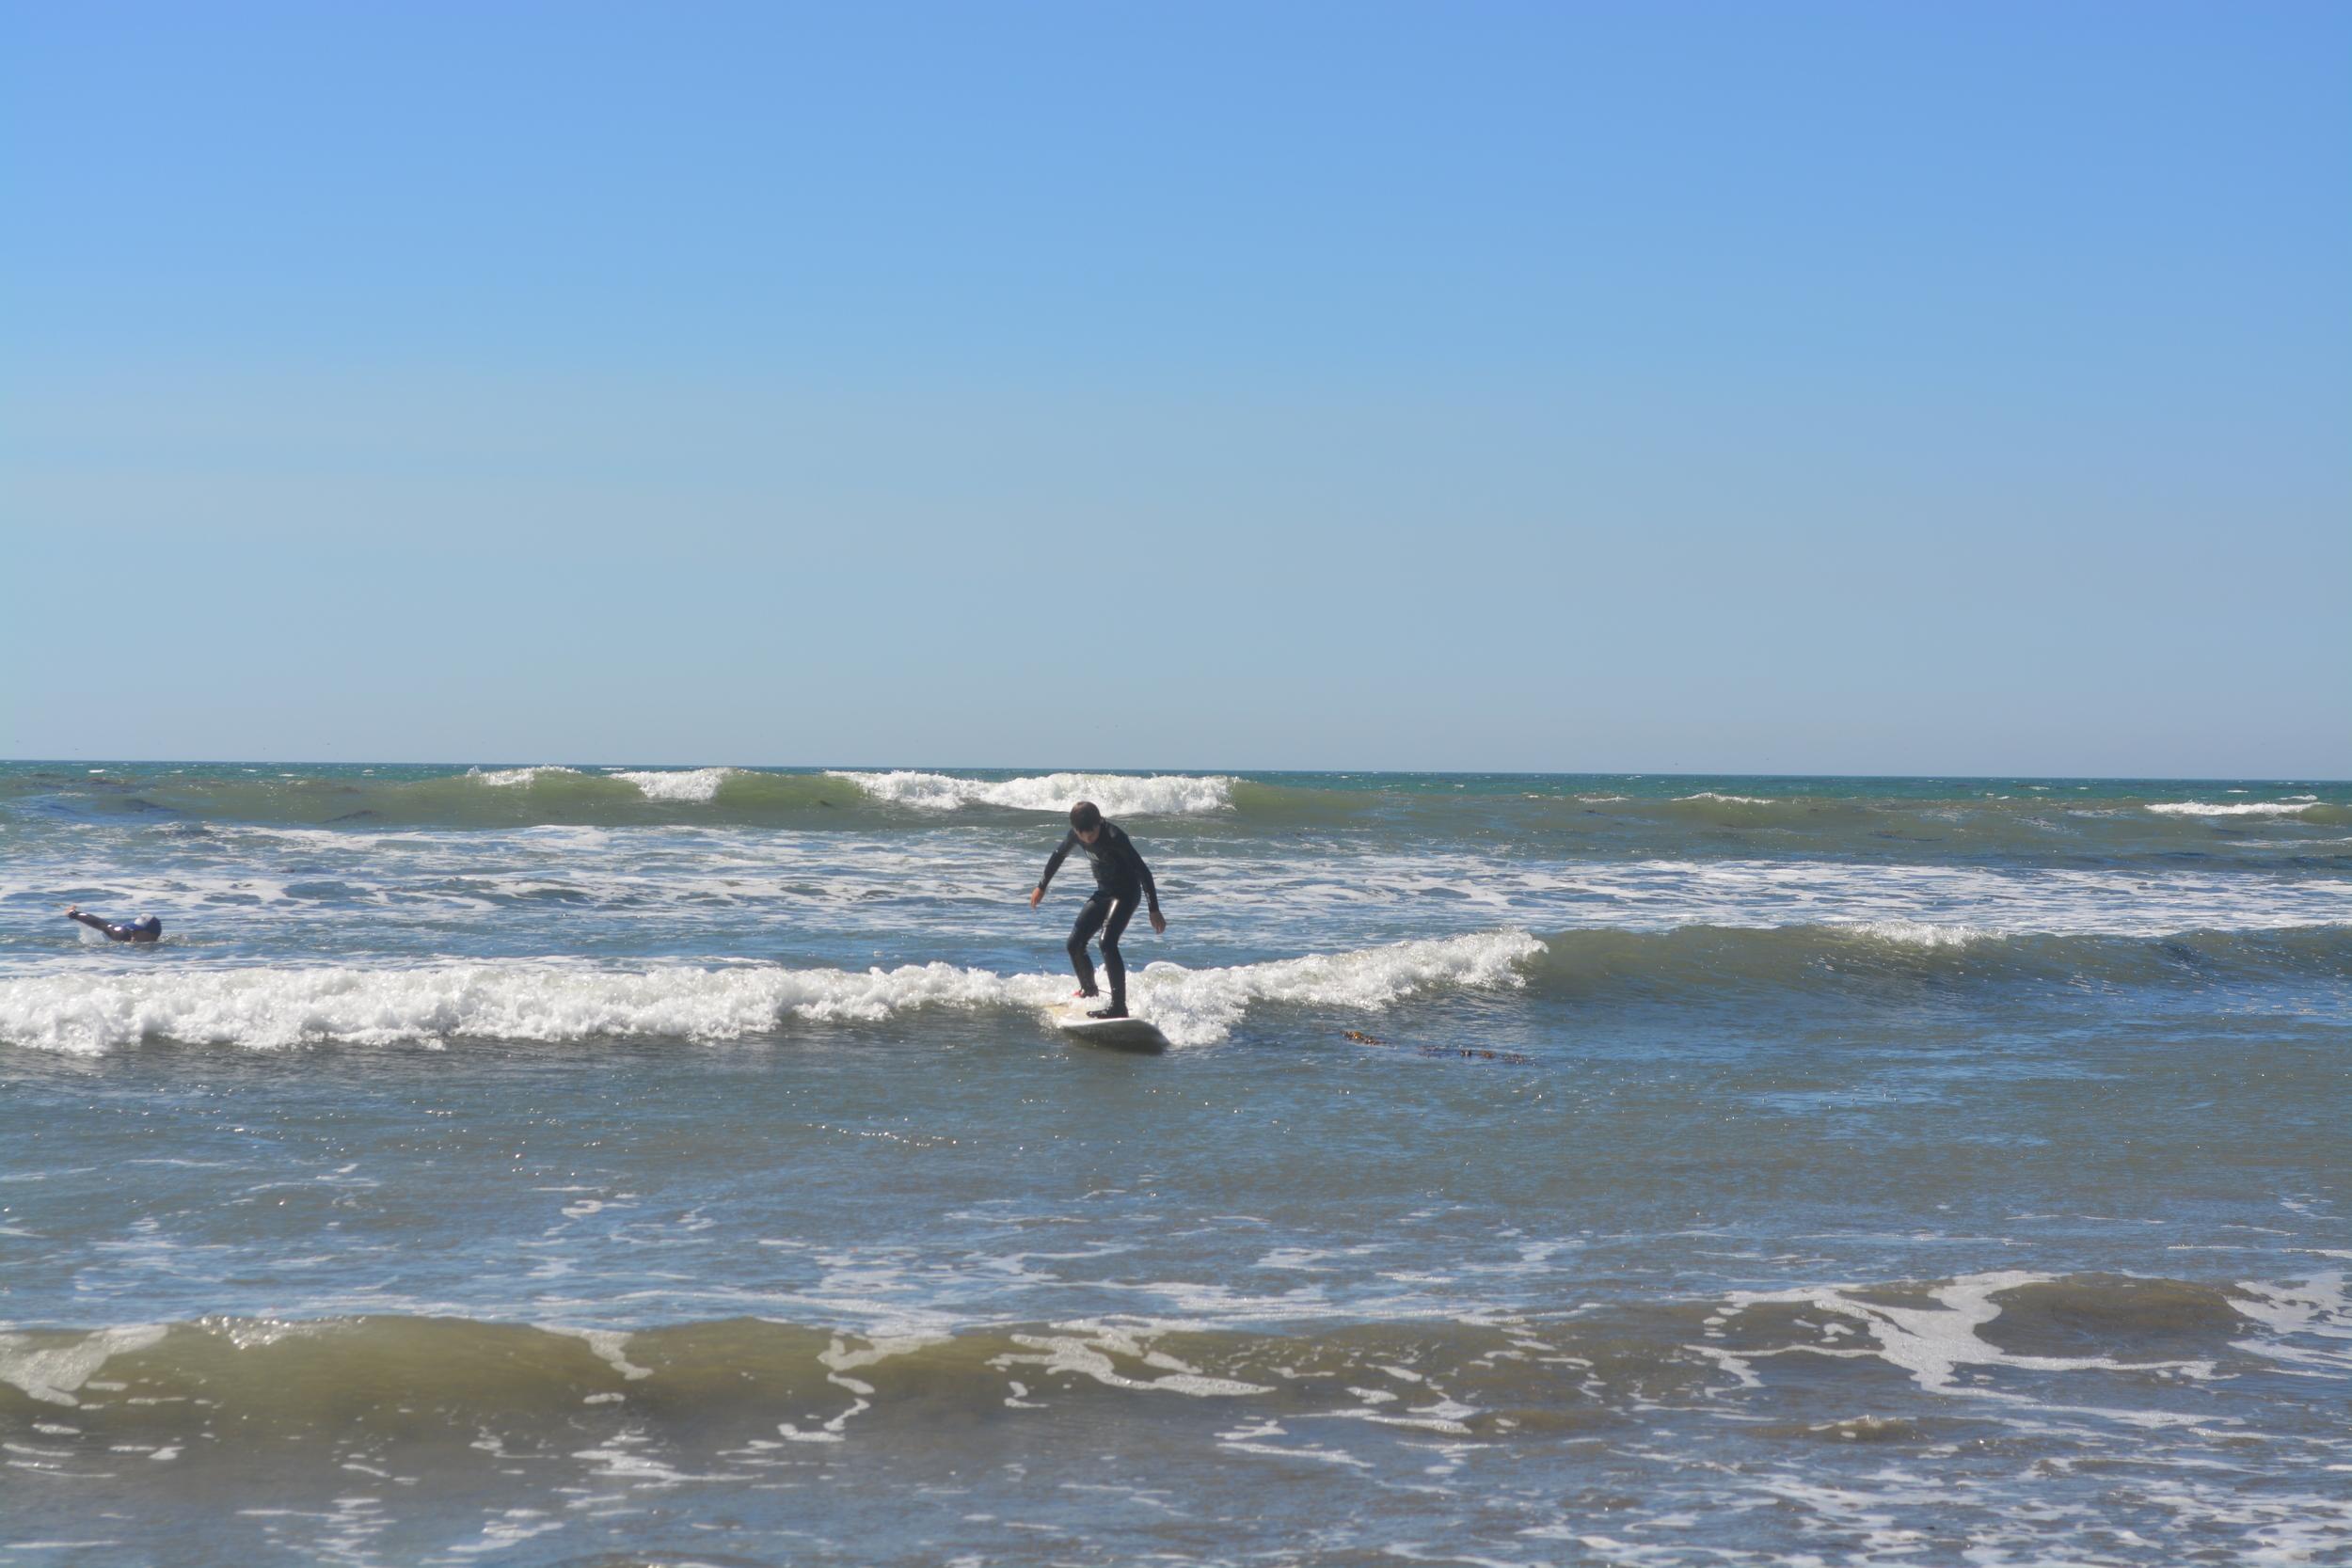 Baja California 10-5-13 Shipwrecks Surfing Adventure Ocean Experience Surf School San Diego (17).JPG